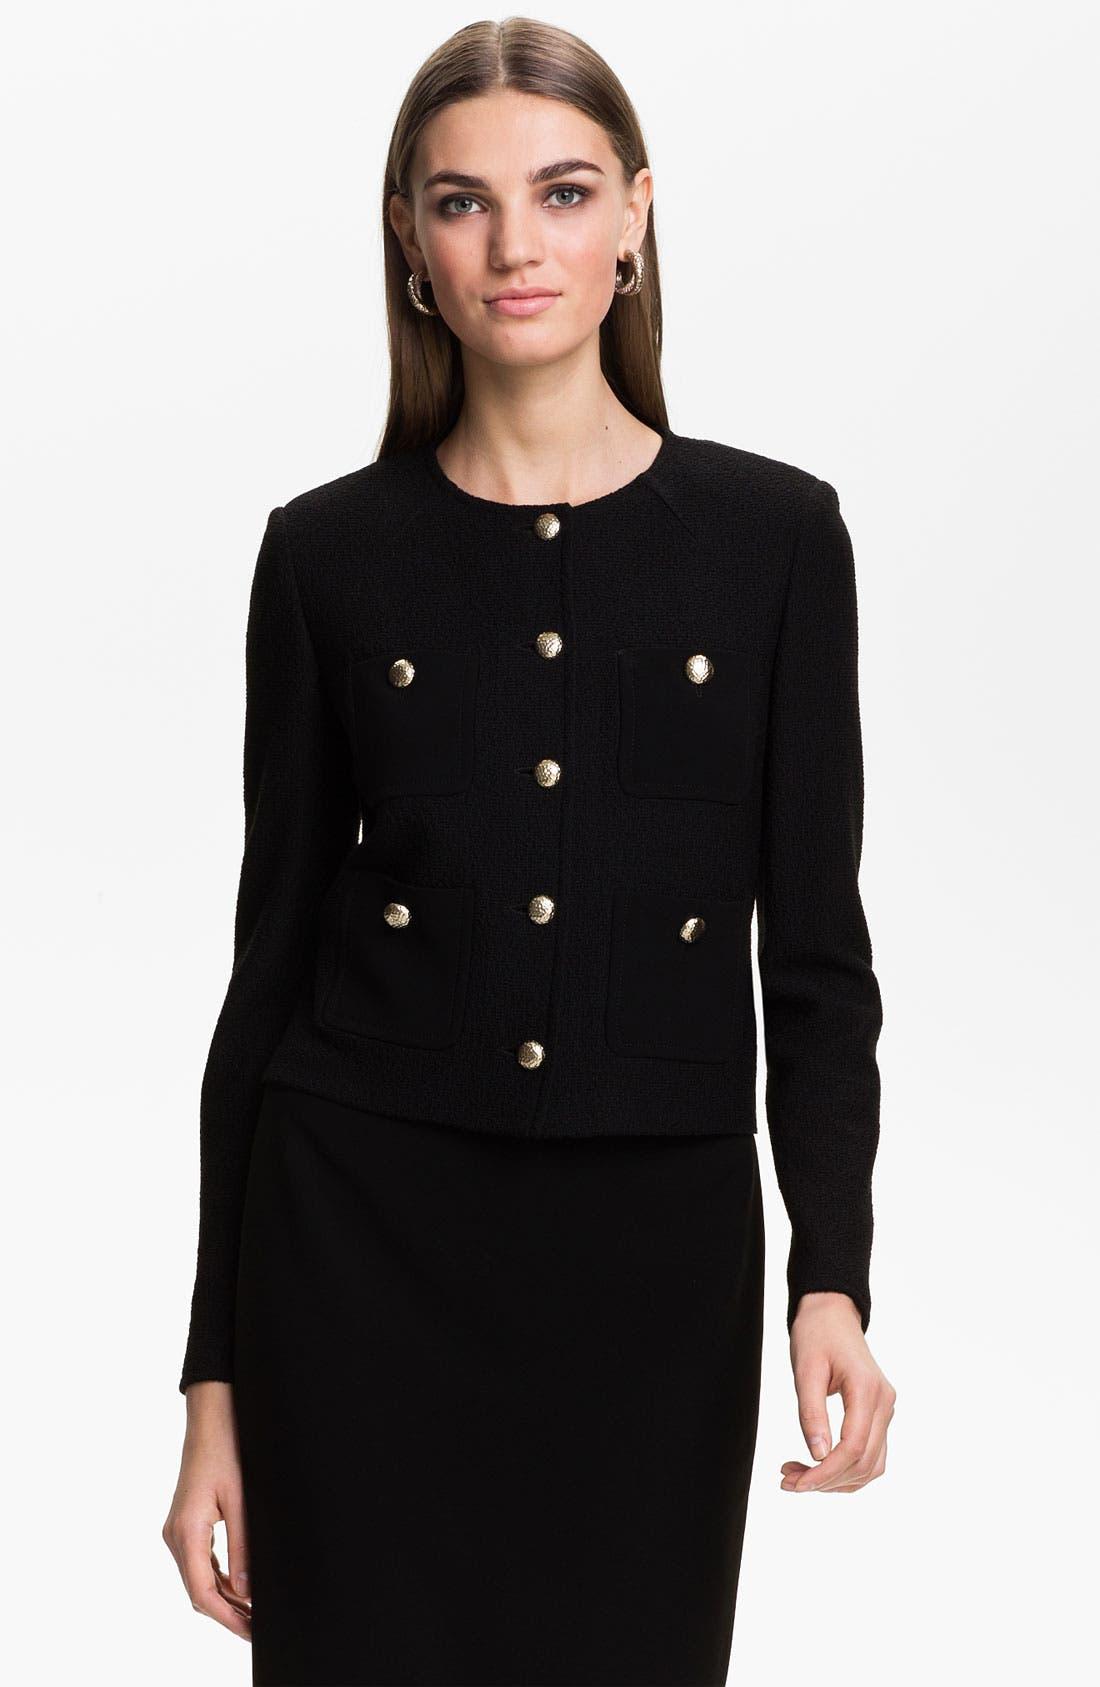 Alternate Image 1 Selected - St. John Collection Bouclé Knit Jacket